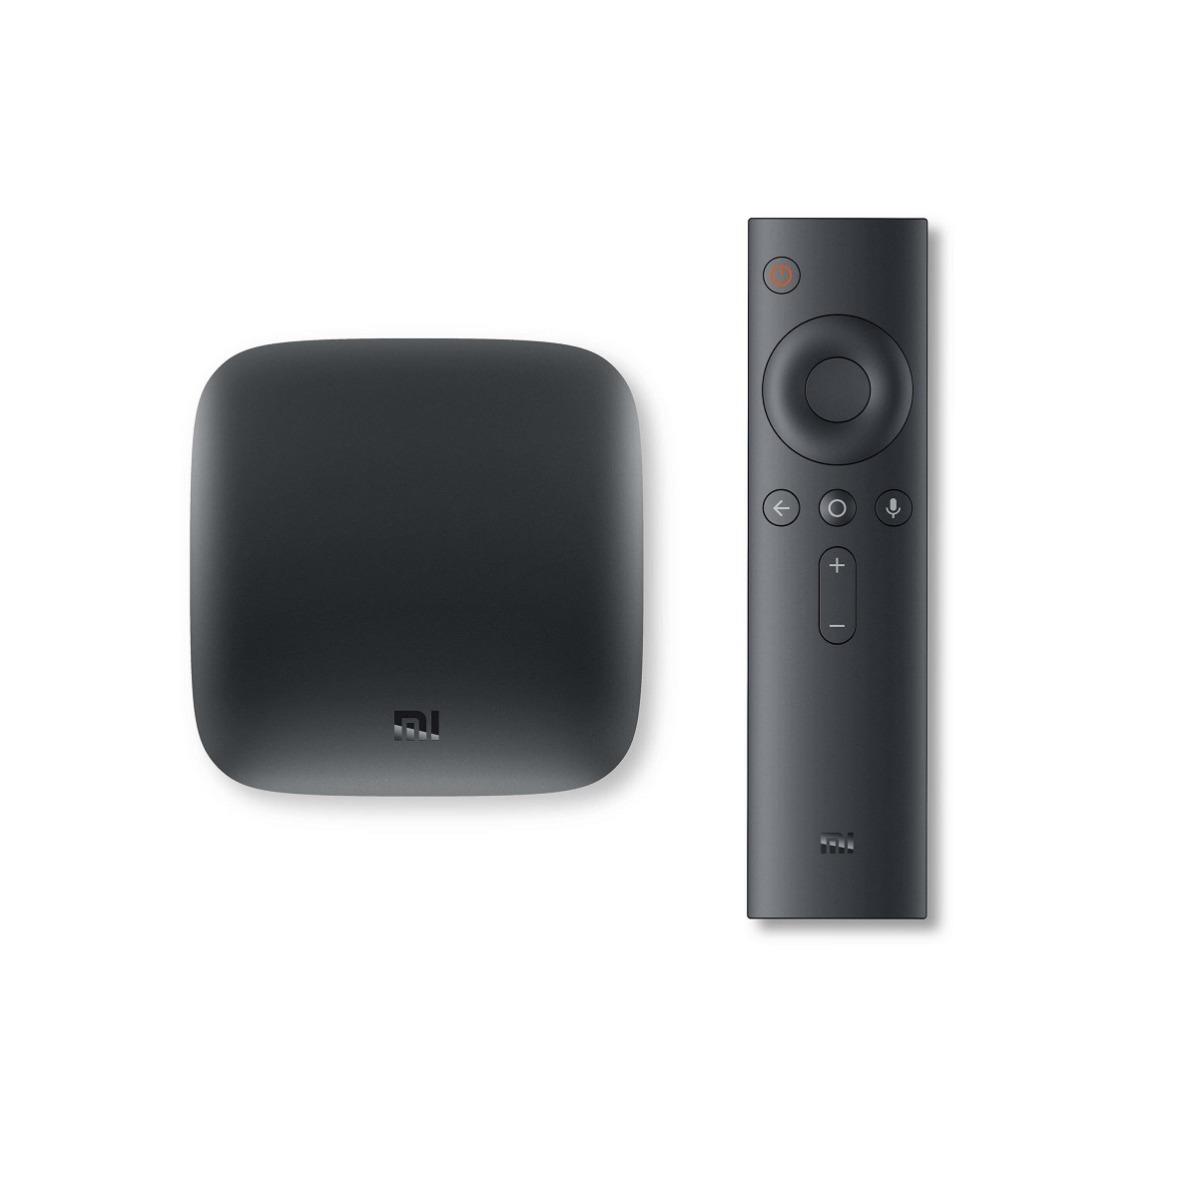 Mi Box S Xiaomi Mi Box 3 Tv Box Android 4k 2g 8g